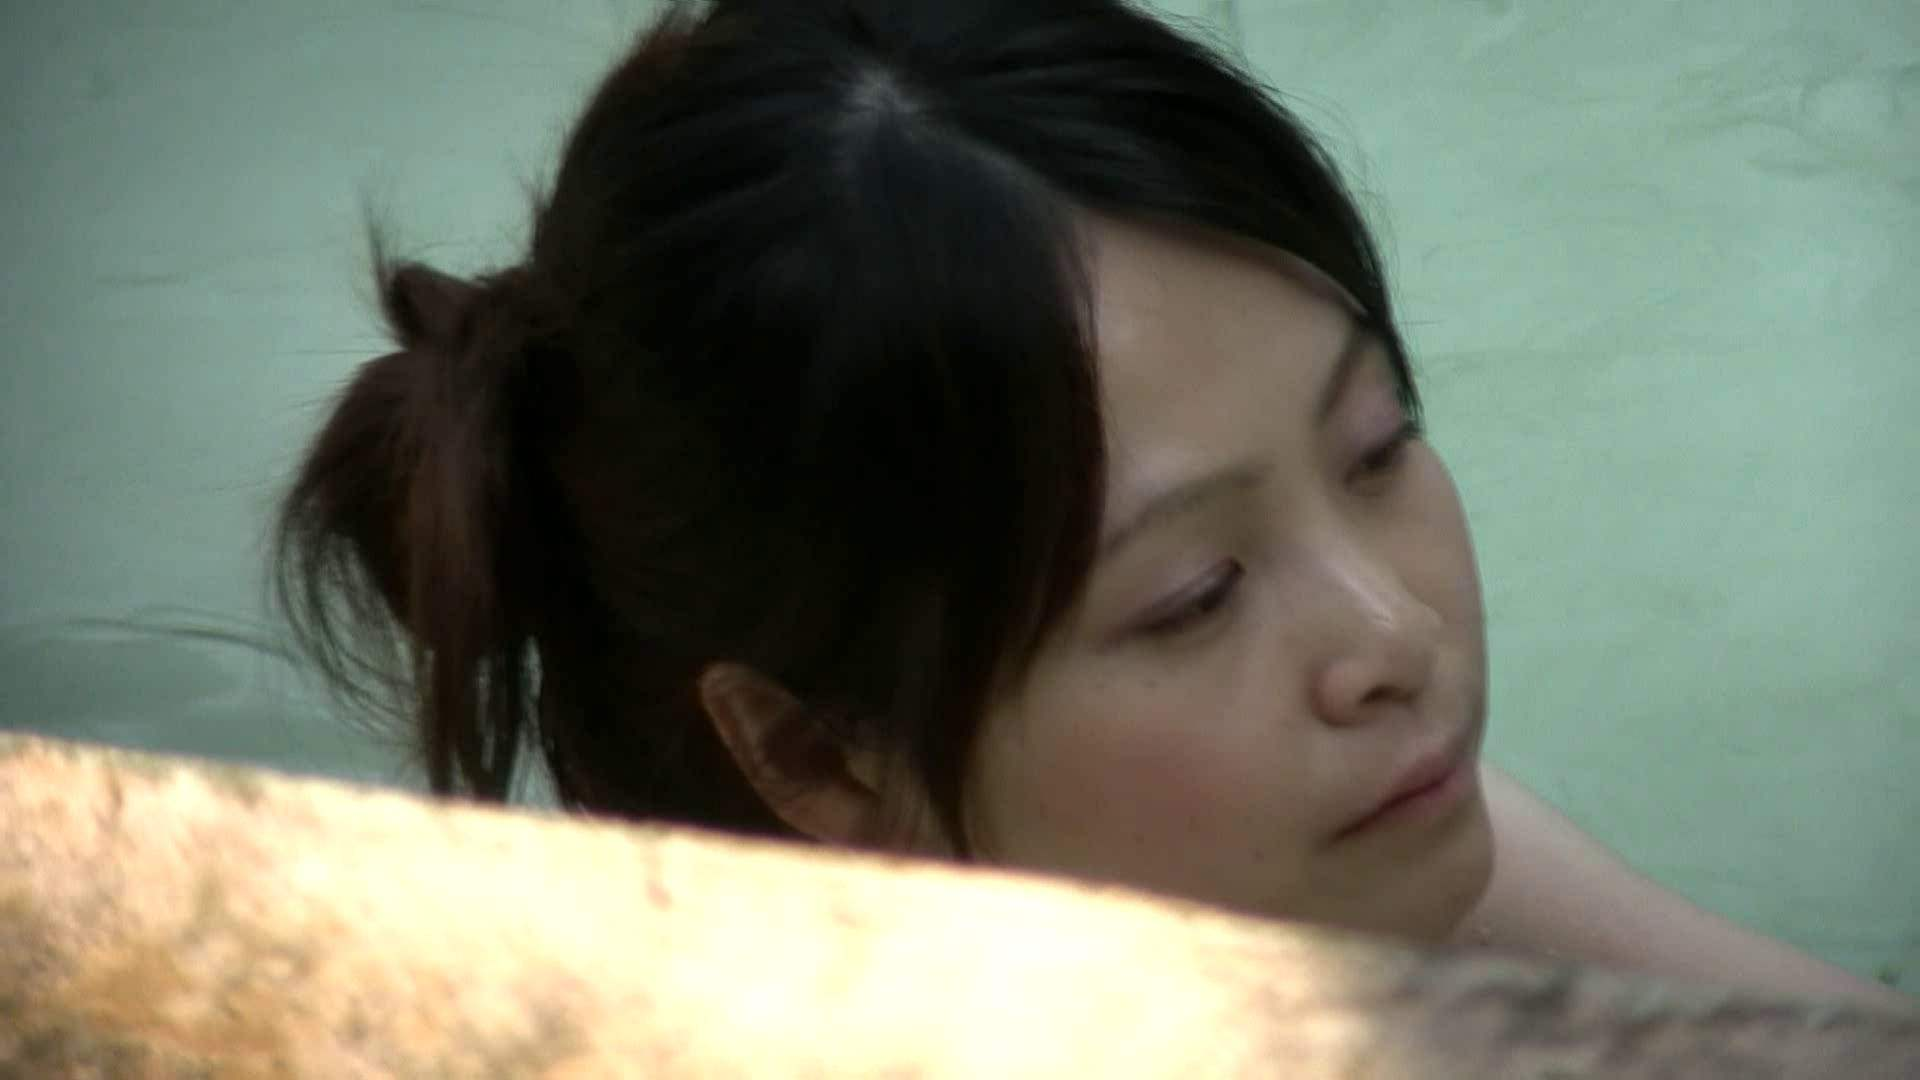 Aquaな露天風呂Vol.652 0   0  41連発 5